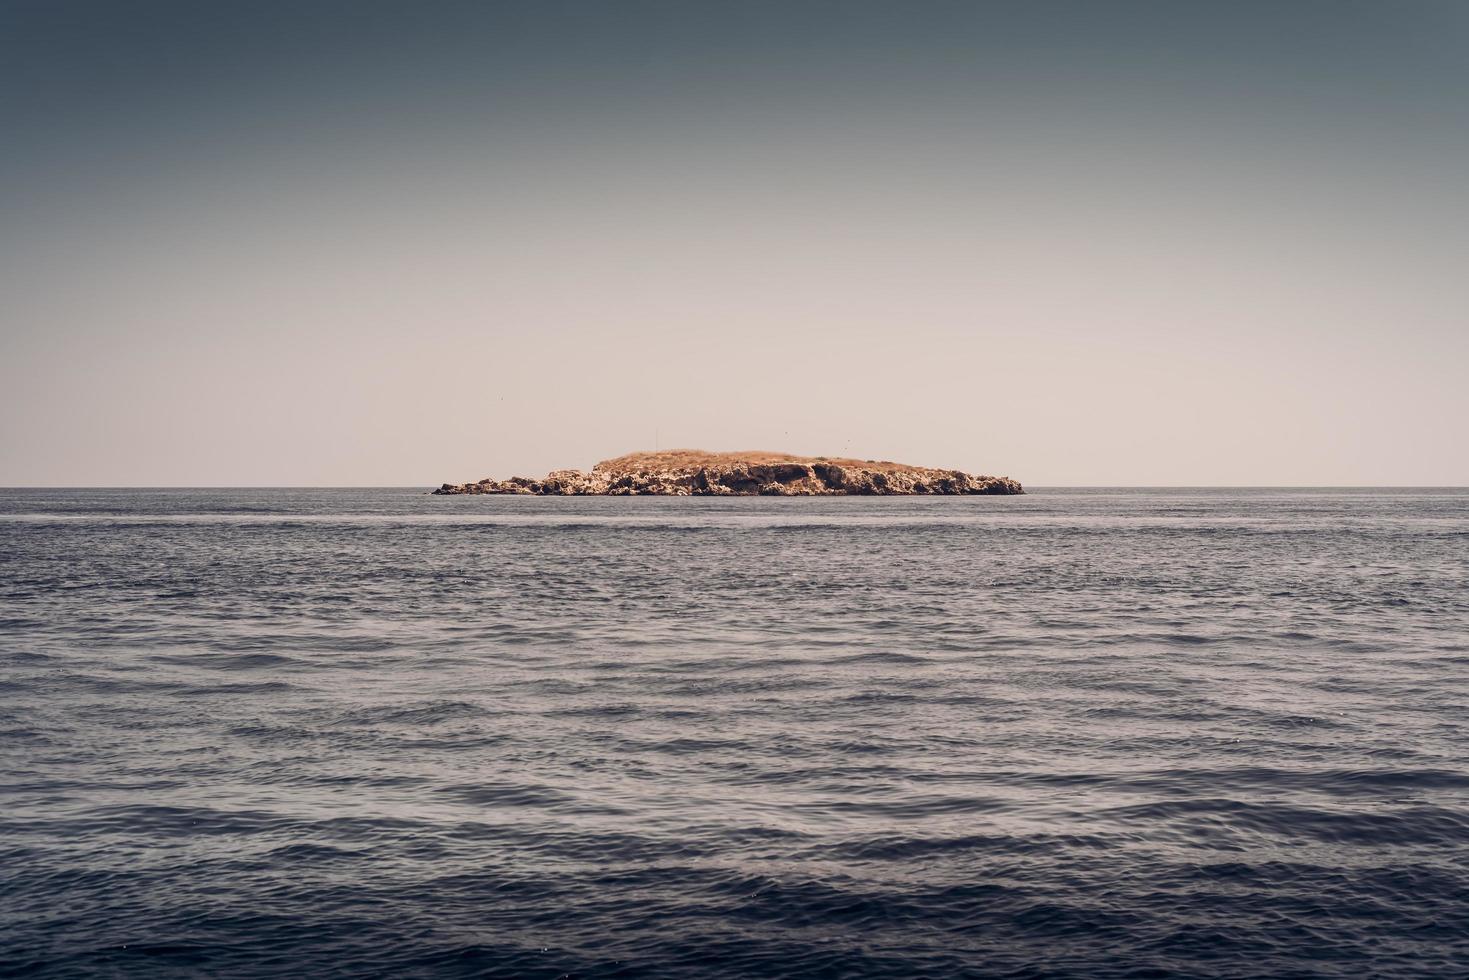 st. George Island, Chypre photo